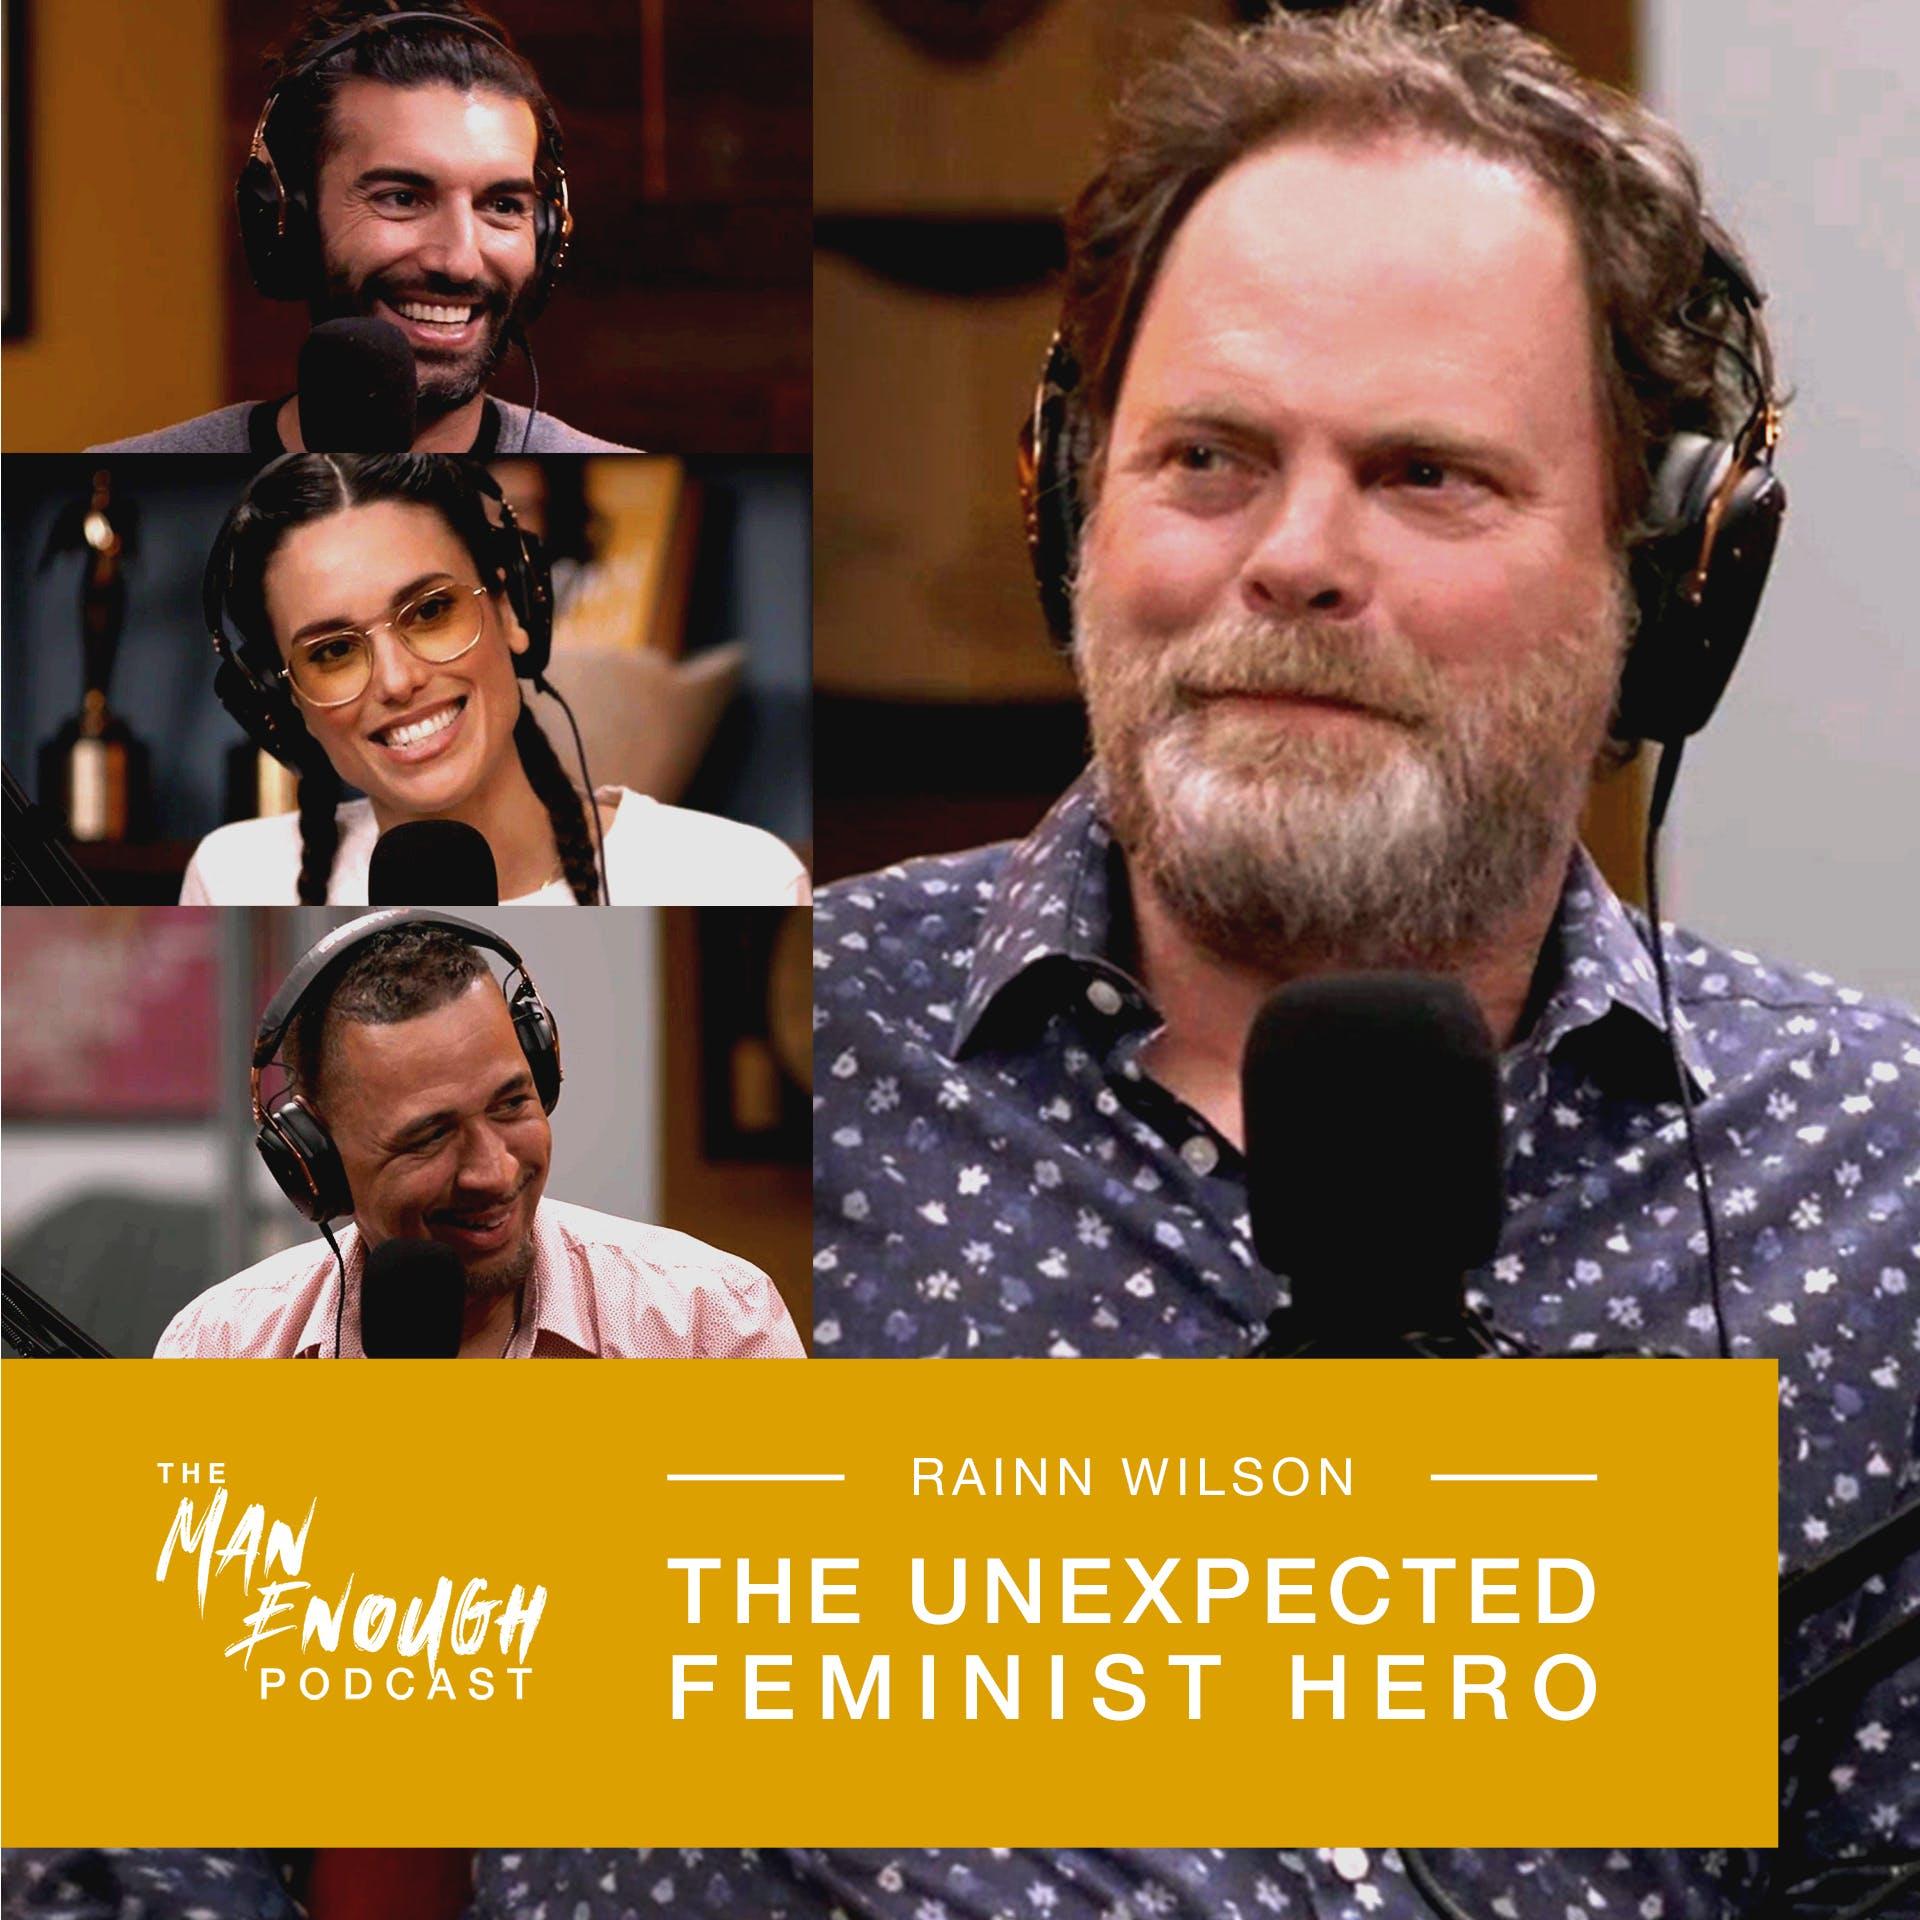 Rainn Wilson: The Unexpected Feminist Hero